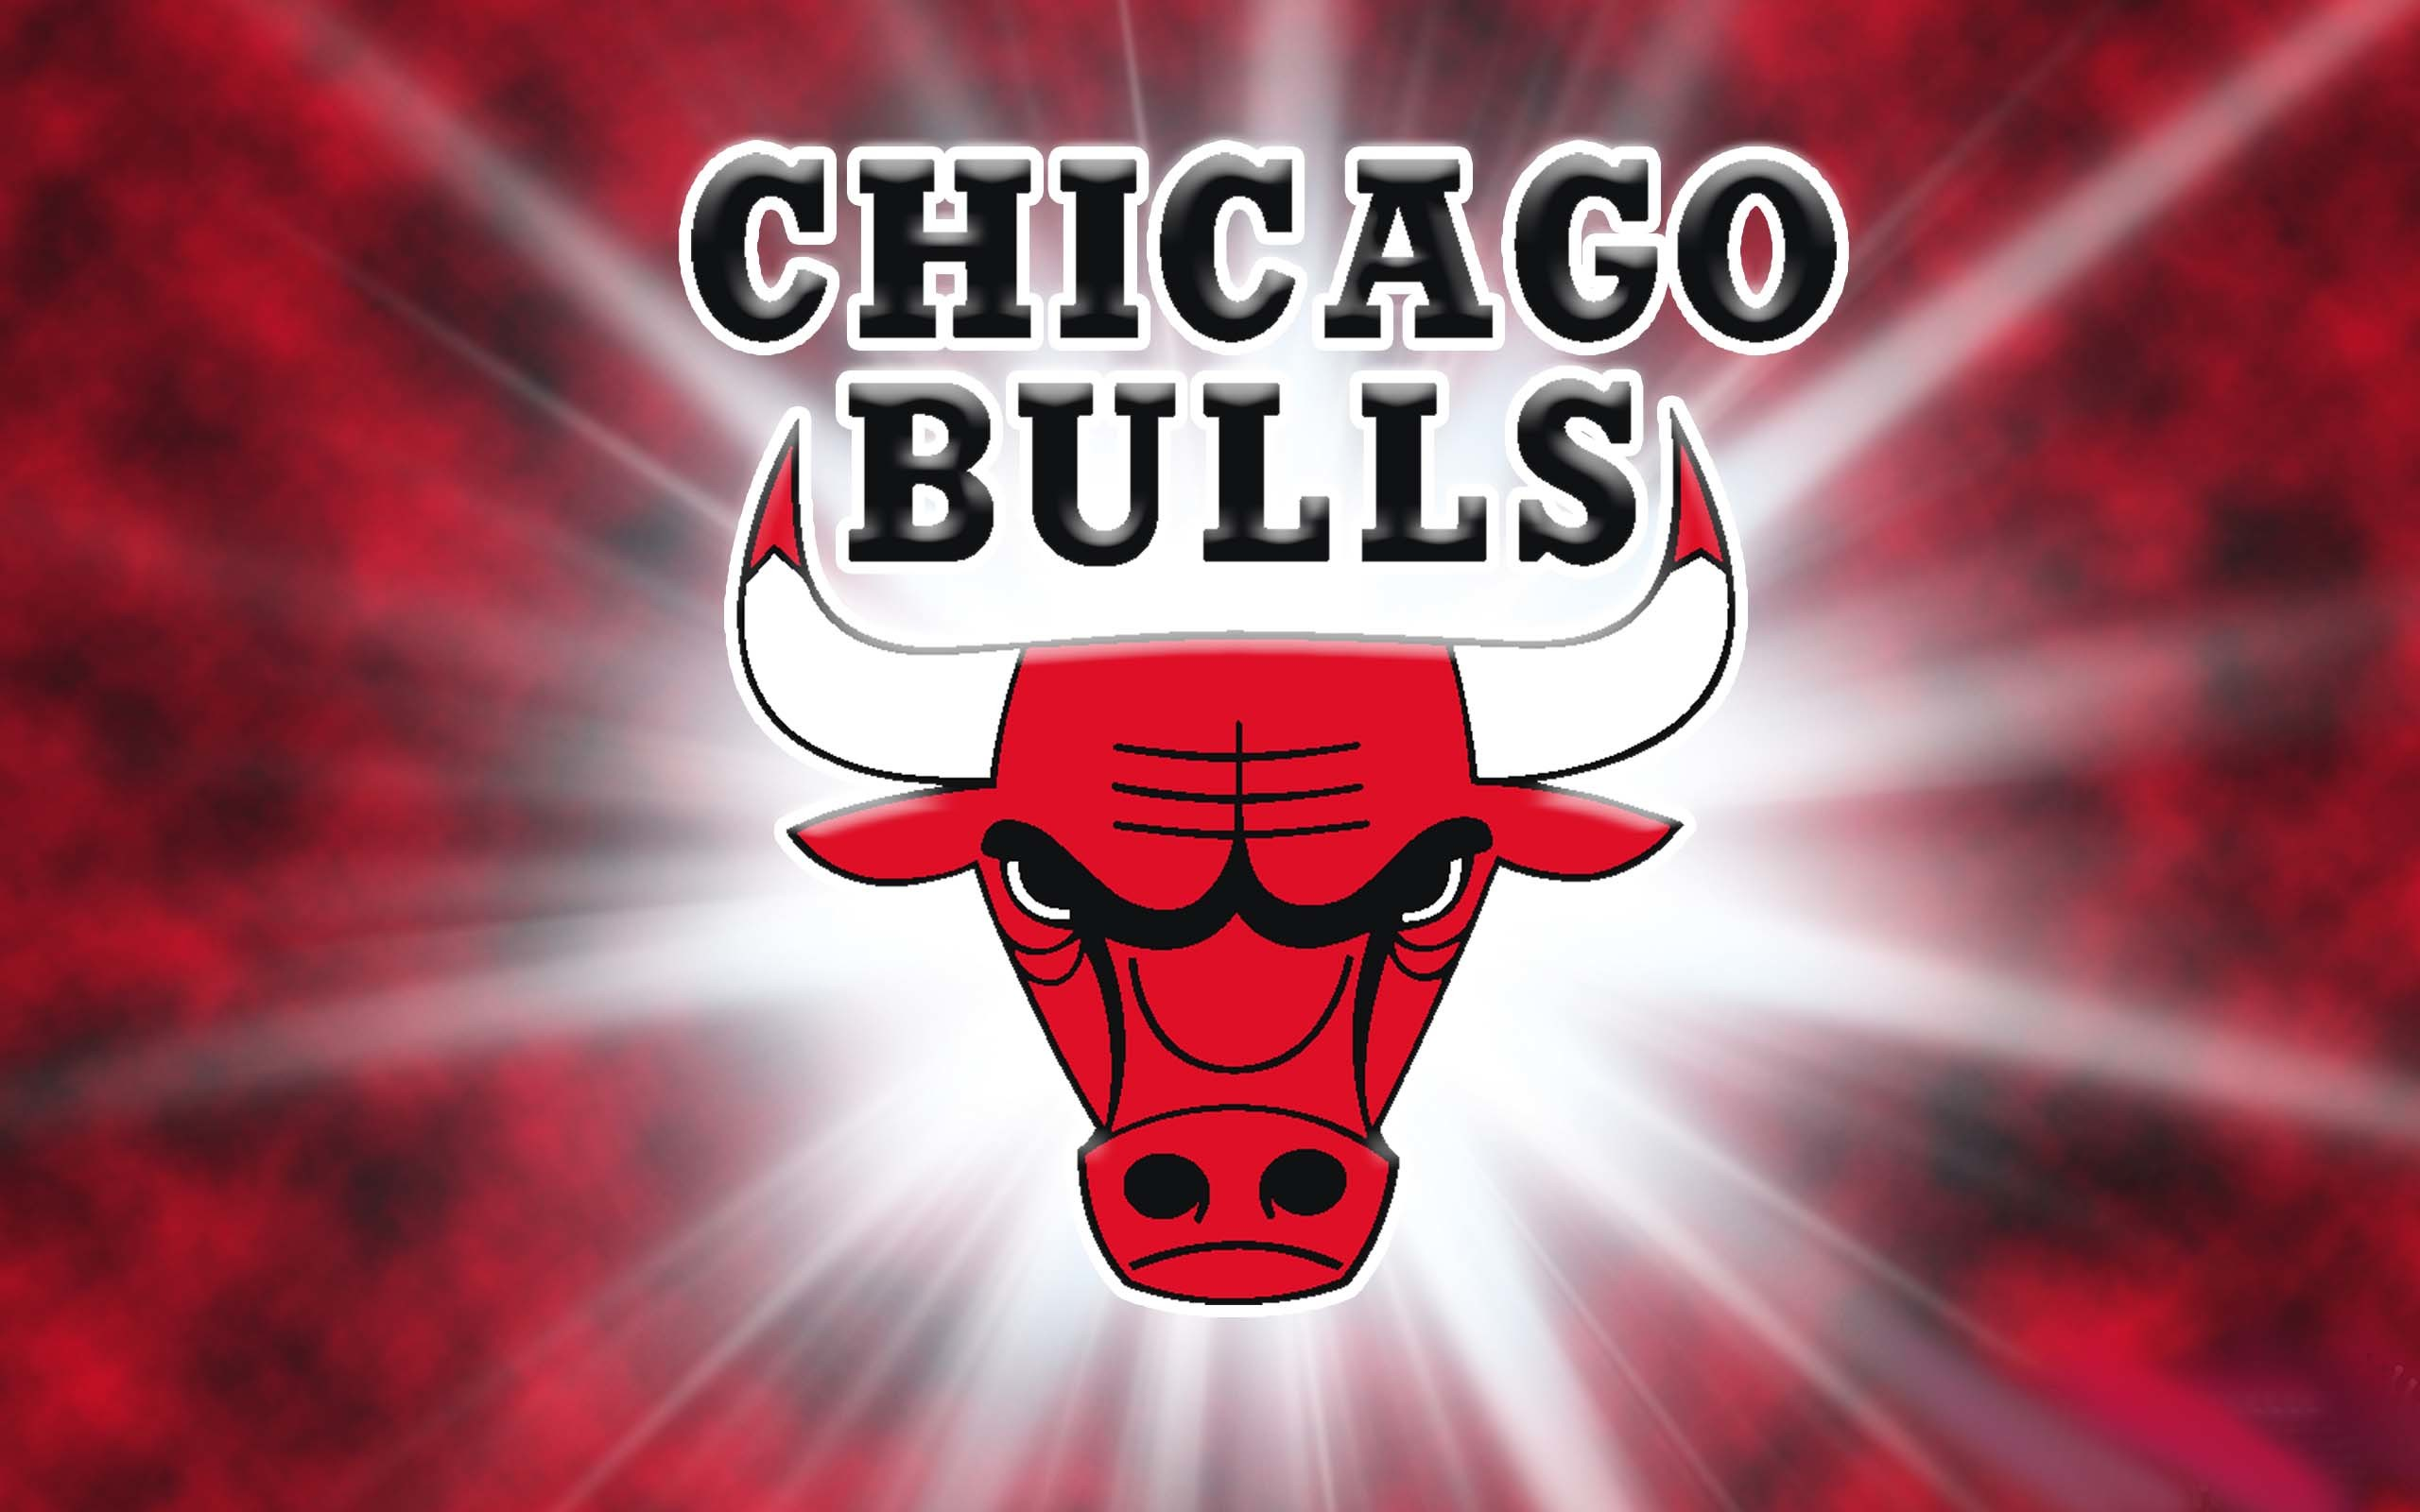 American professional basketball team Chicago Bulls